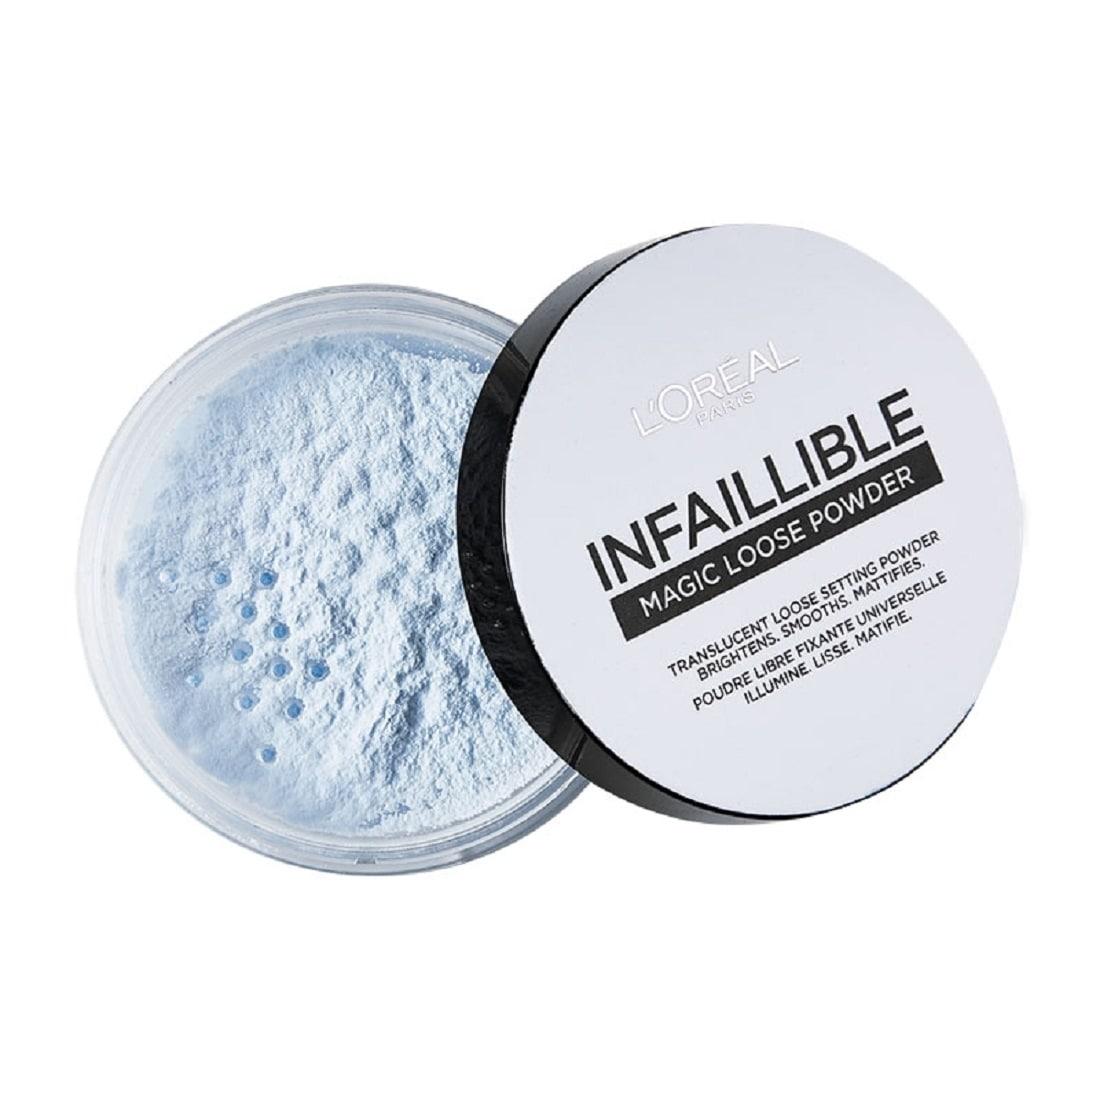 Infaillible Magic Loose Powder